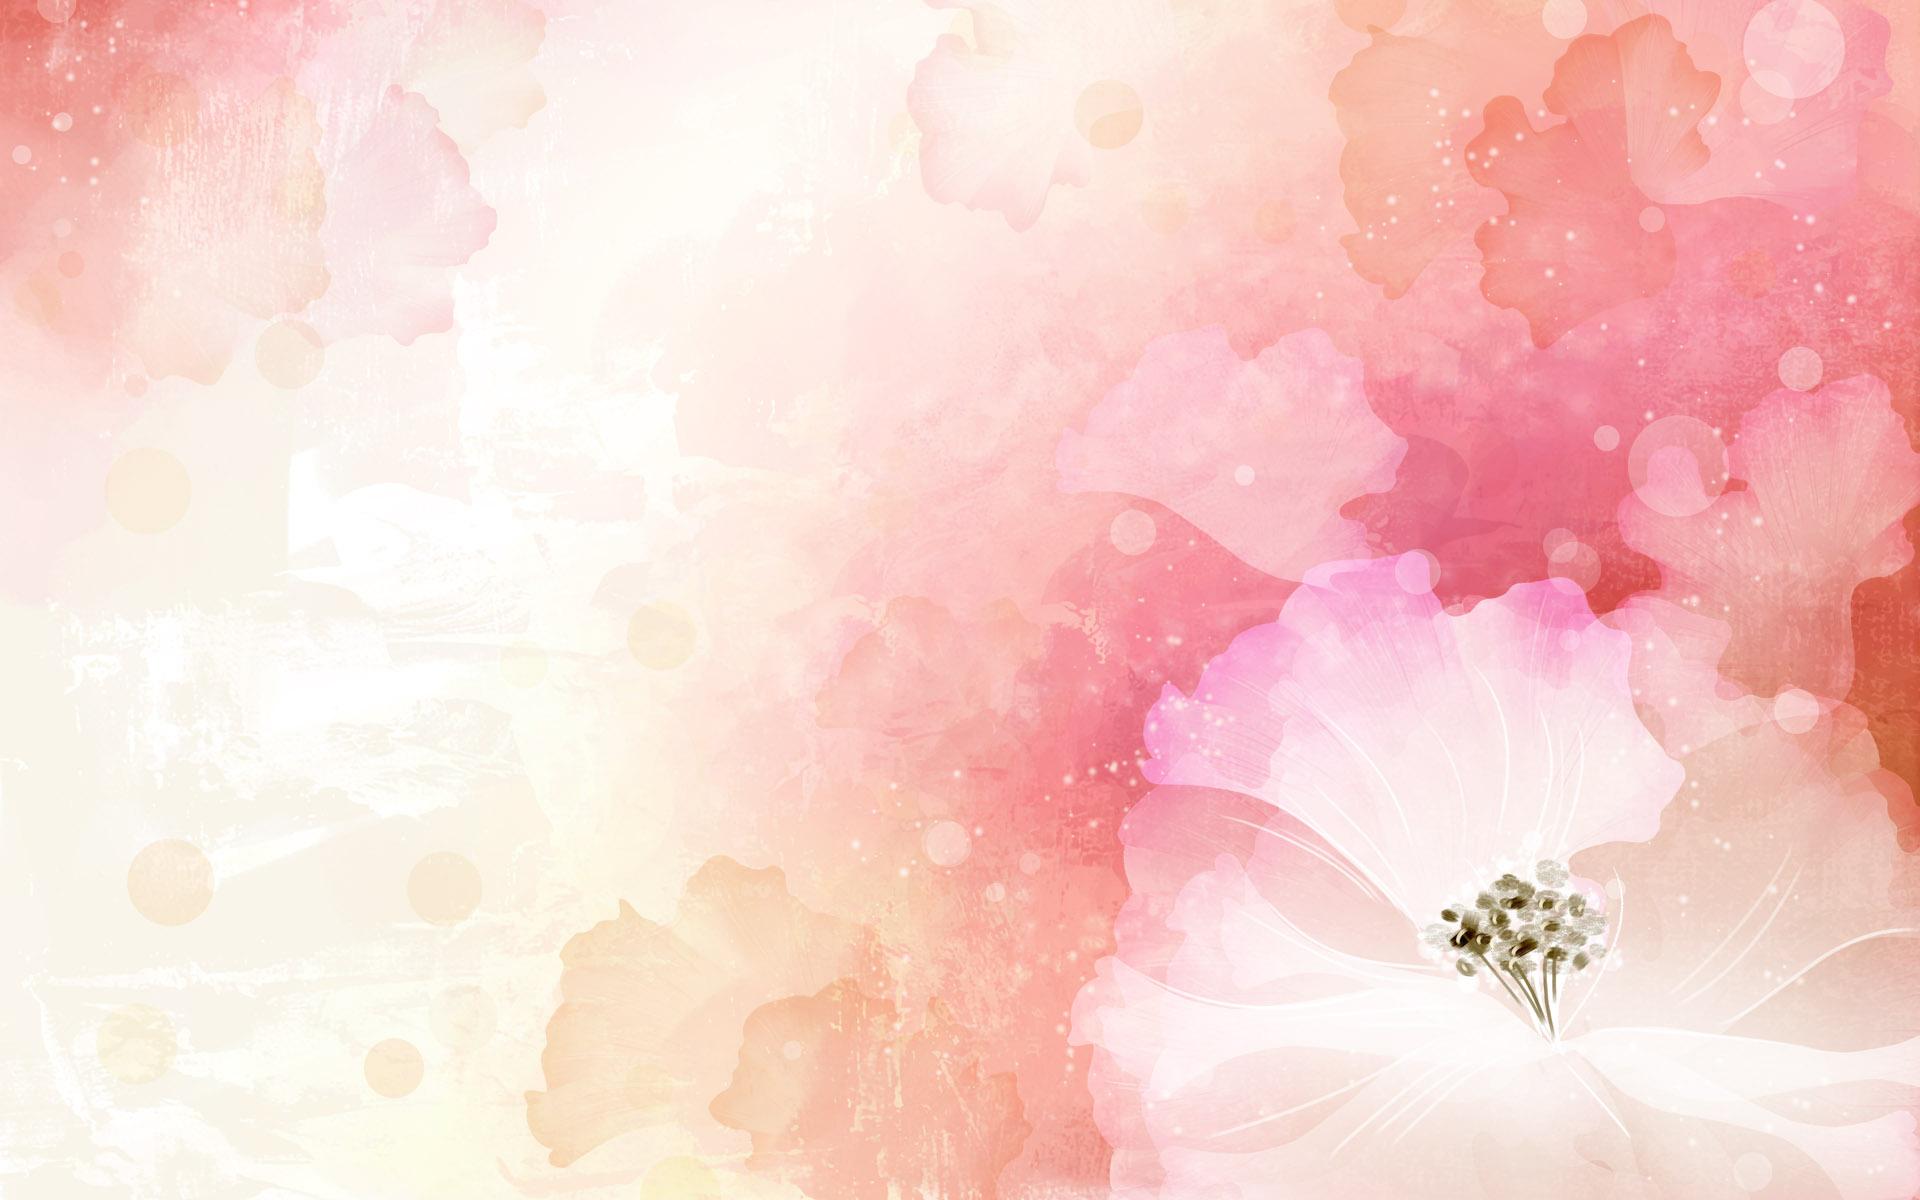 ppt模板 ppt素材 朦胧粉色水彩花蕊ppt背景图片  类别:ppt素材 格式